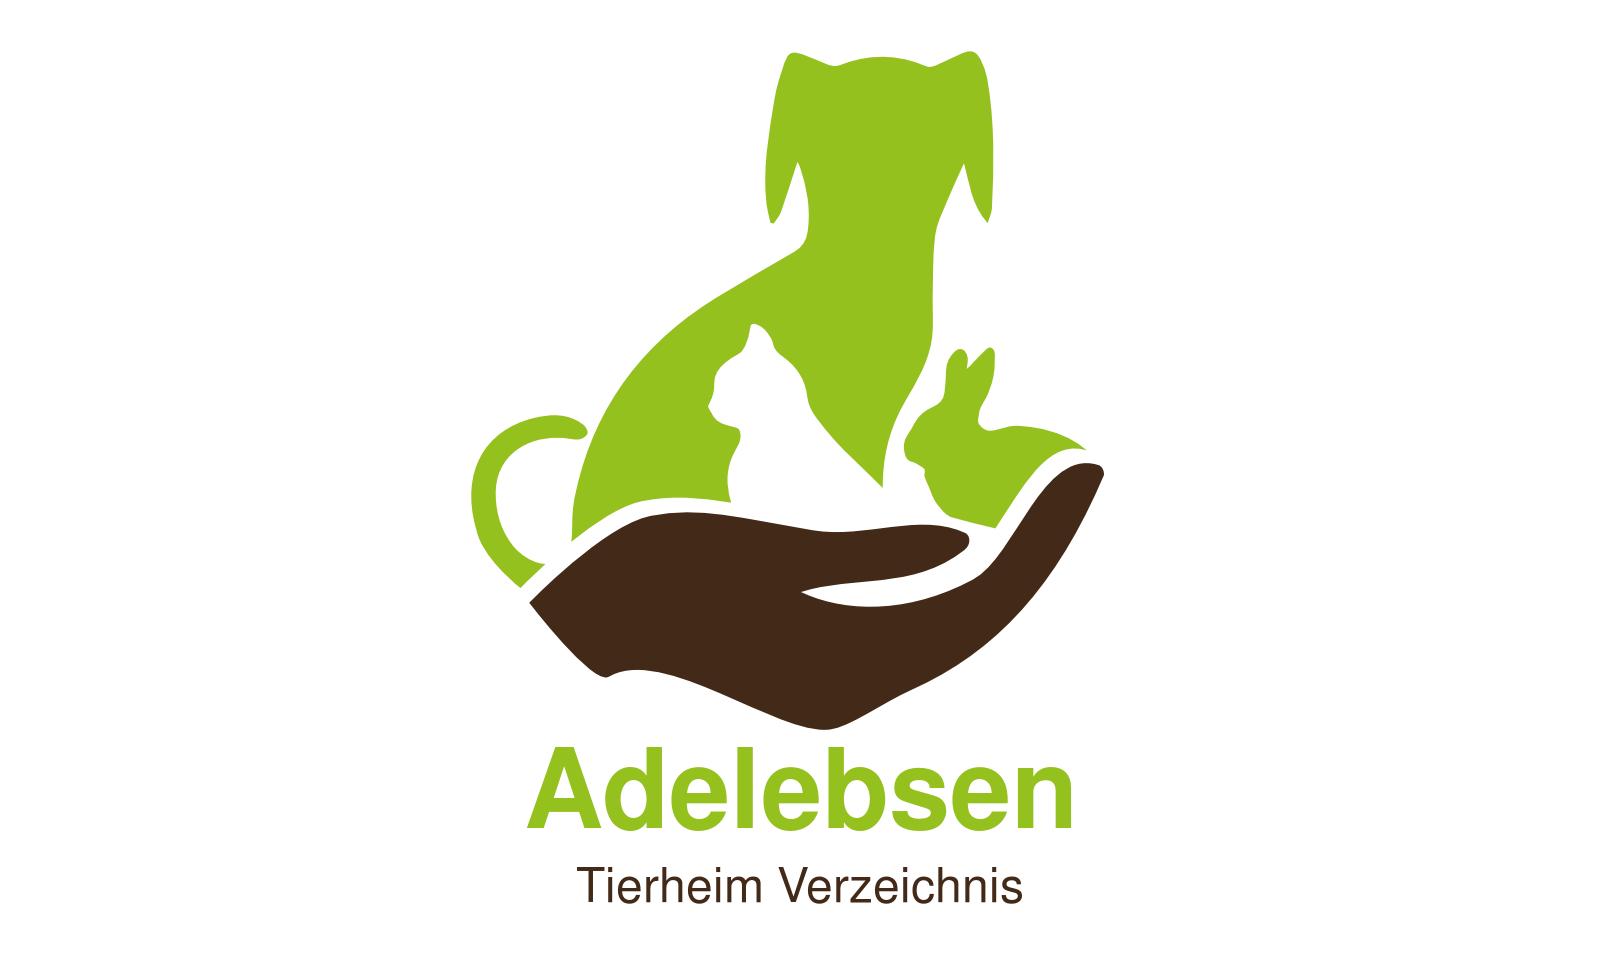 Tierheim Adelebsen